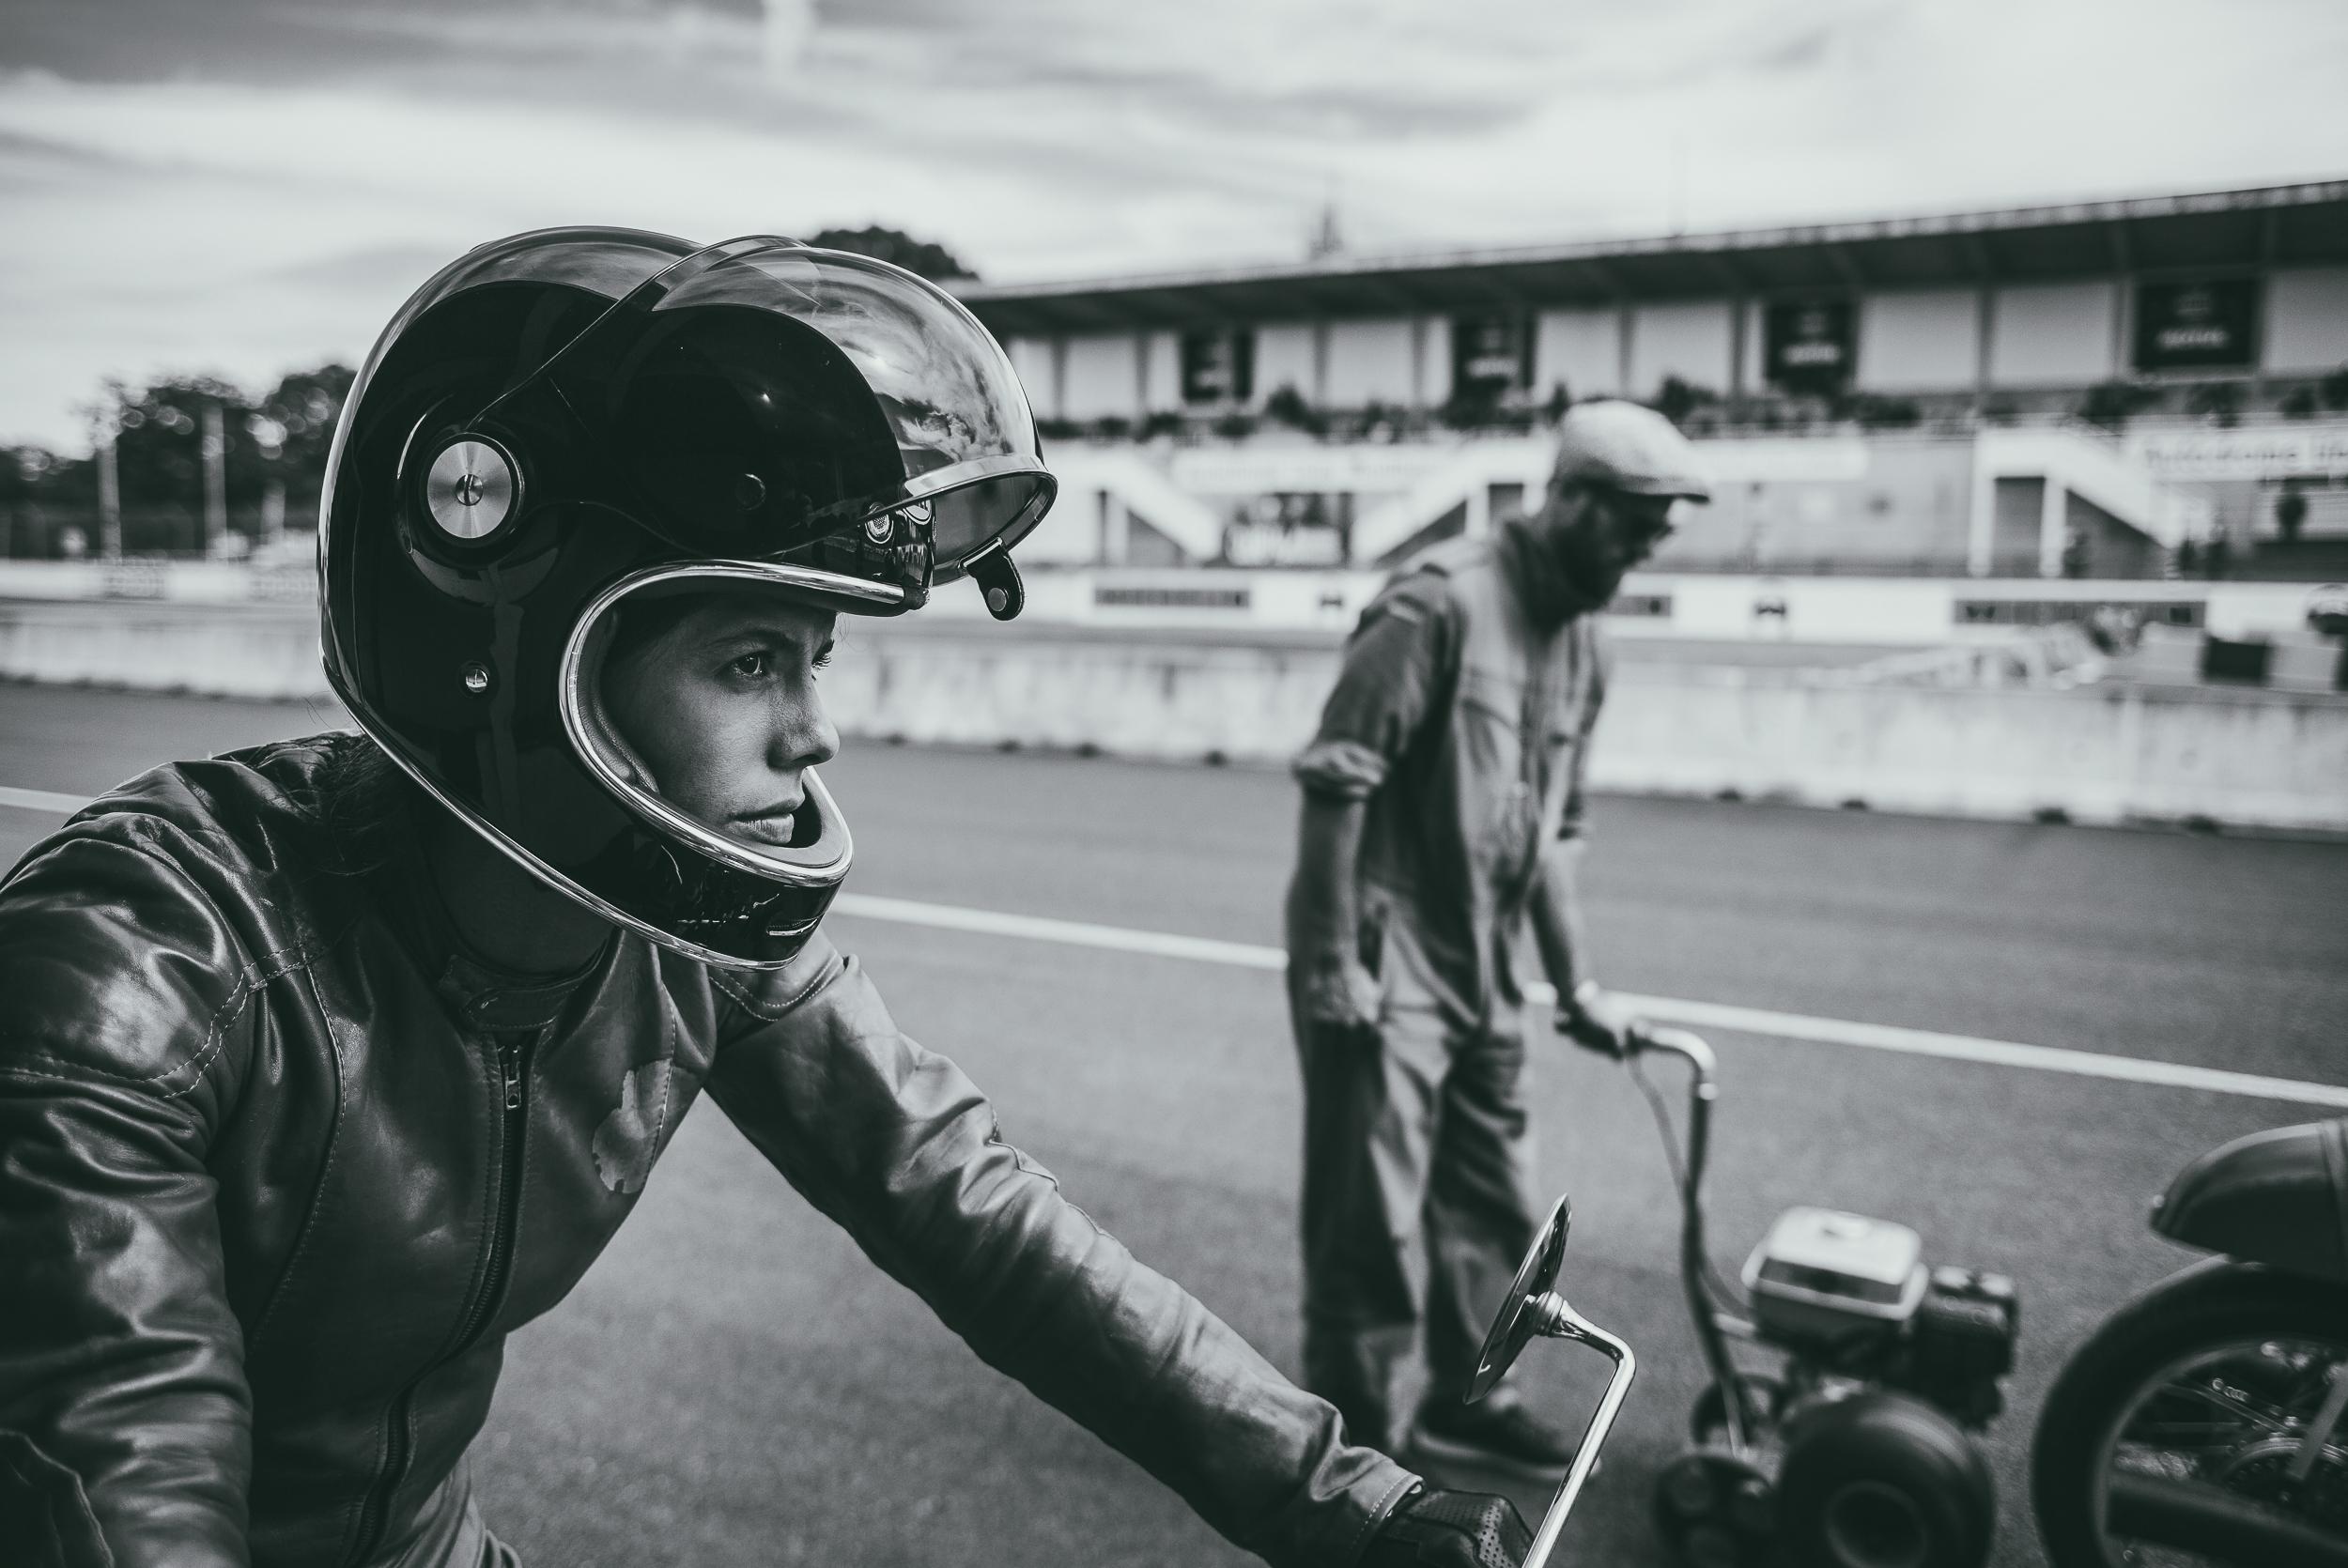 Editorial_Fotografie_Alex_Dietrich_Stuttgart_Portrait_Race_Cafe_Racer.jpg